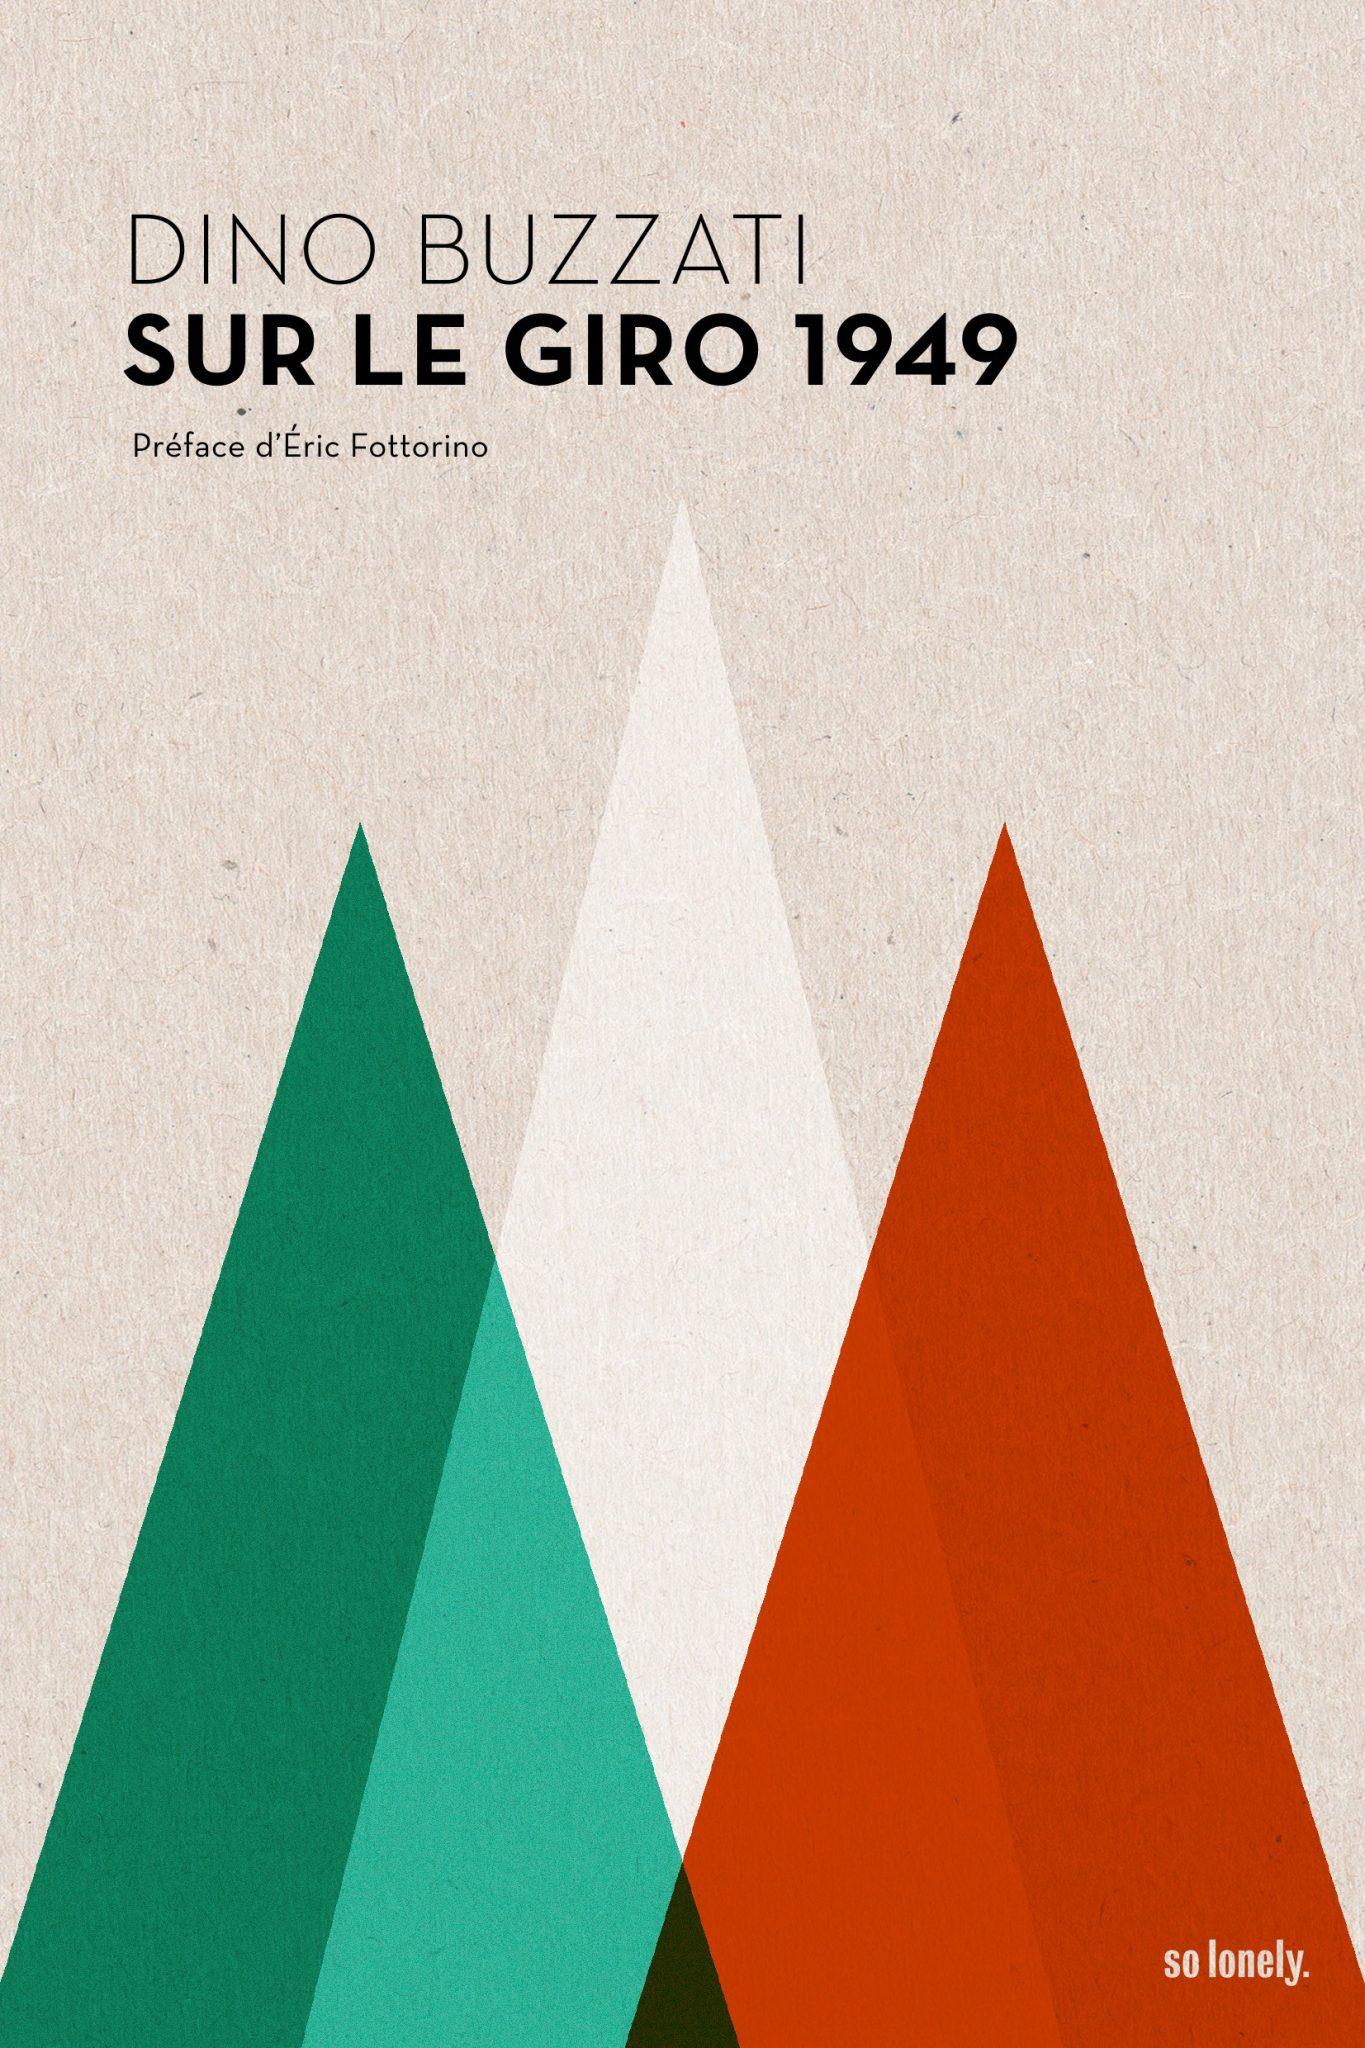 sur-le-giro-1949-dino-buzzati.jpg